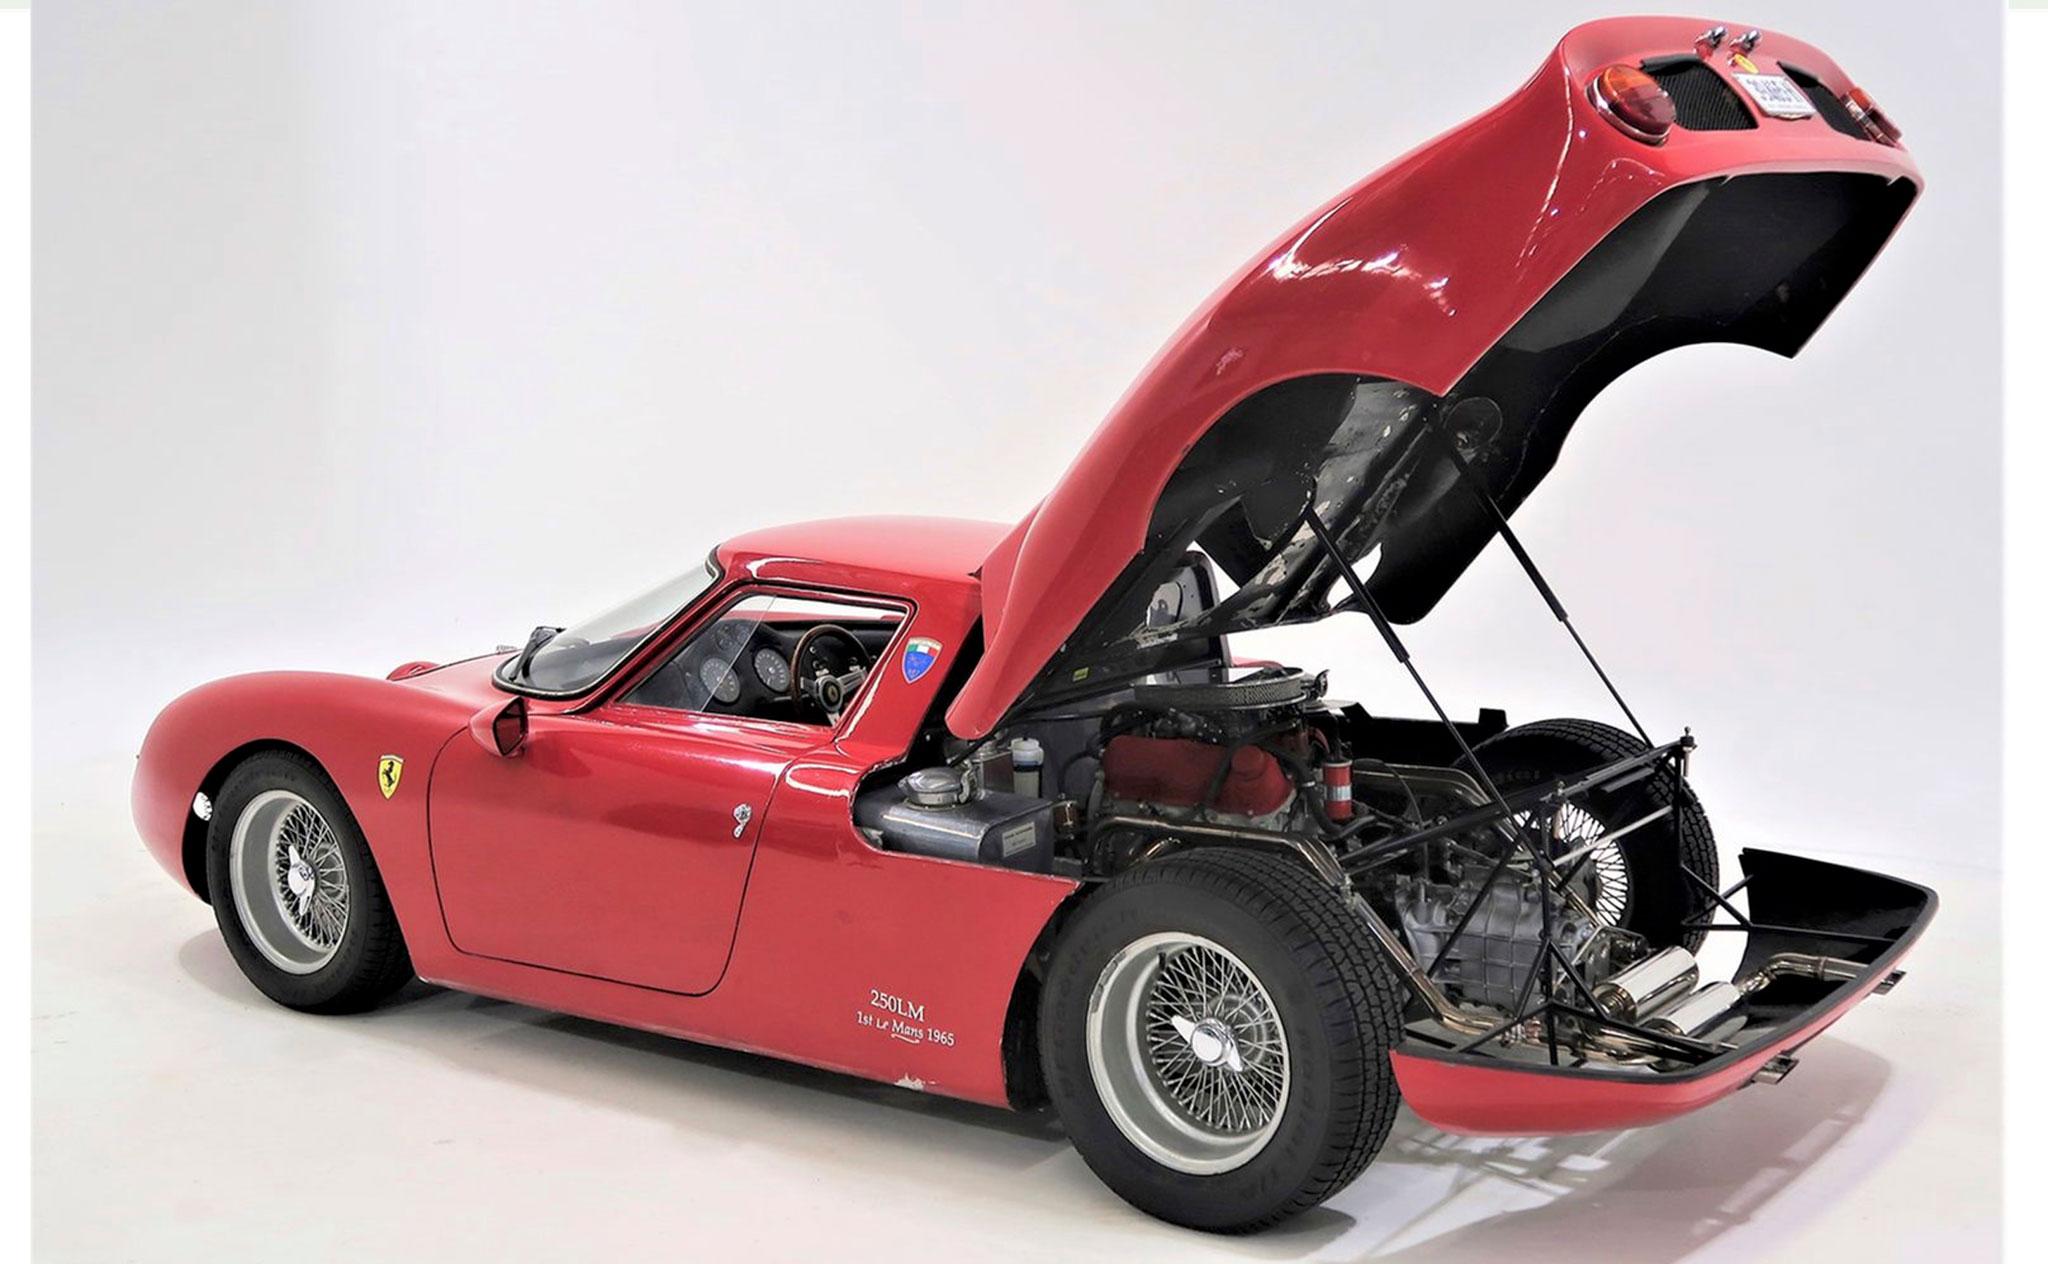 Ferrari 250 LM Replica triste vision du V6 Ford 2.0-Litre.